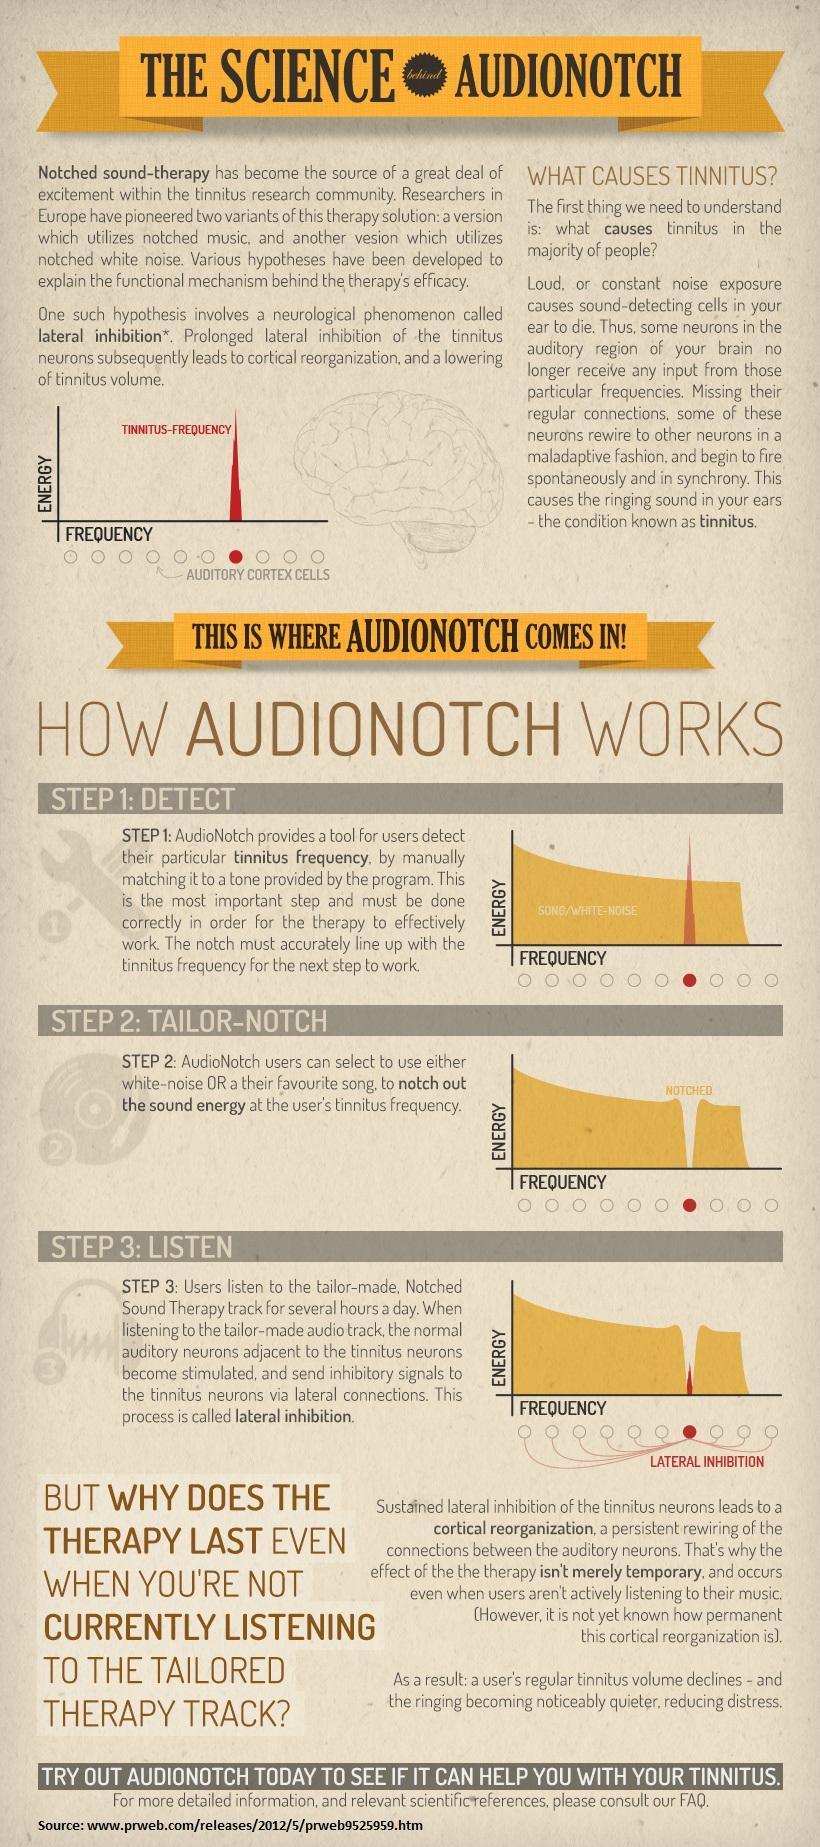 how-audionotch-works_5215ffe4d311e